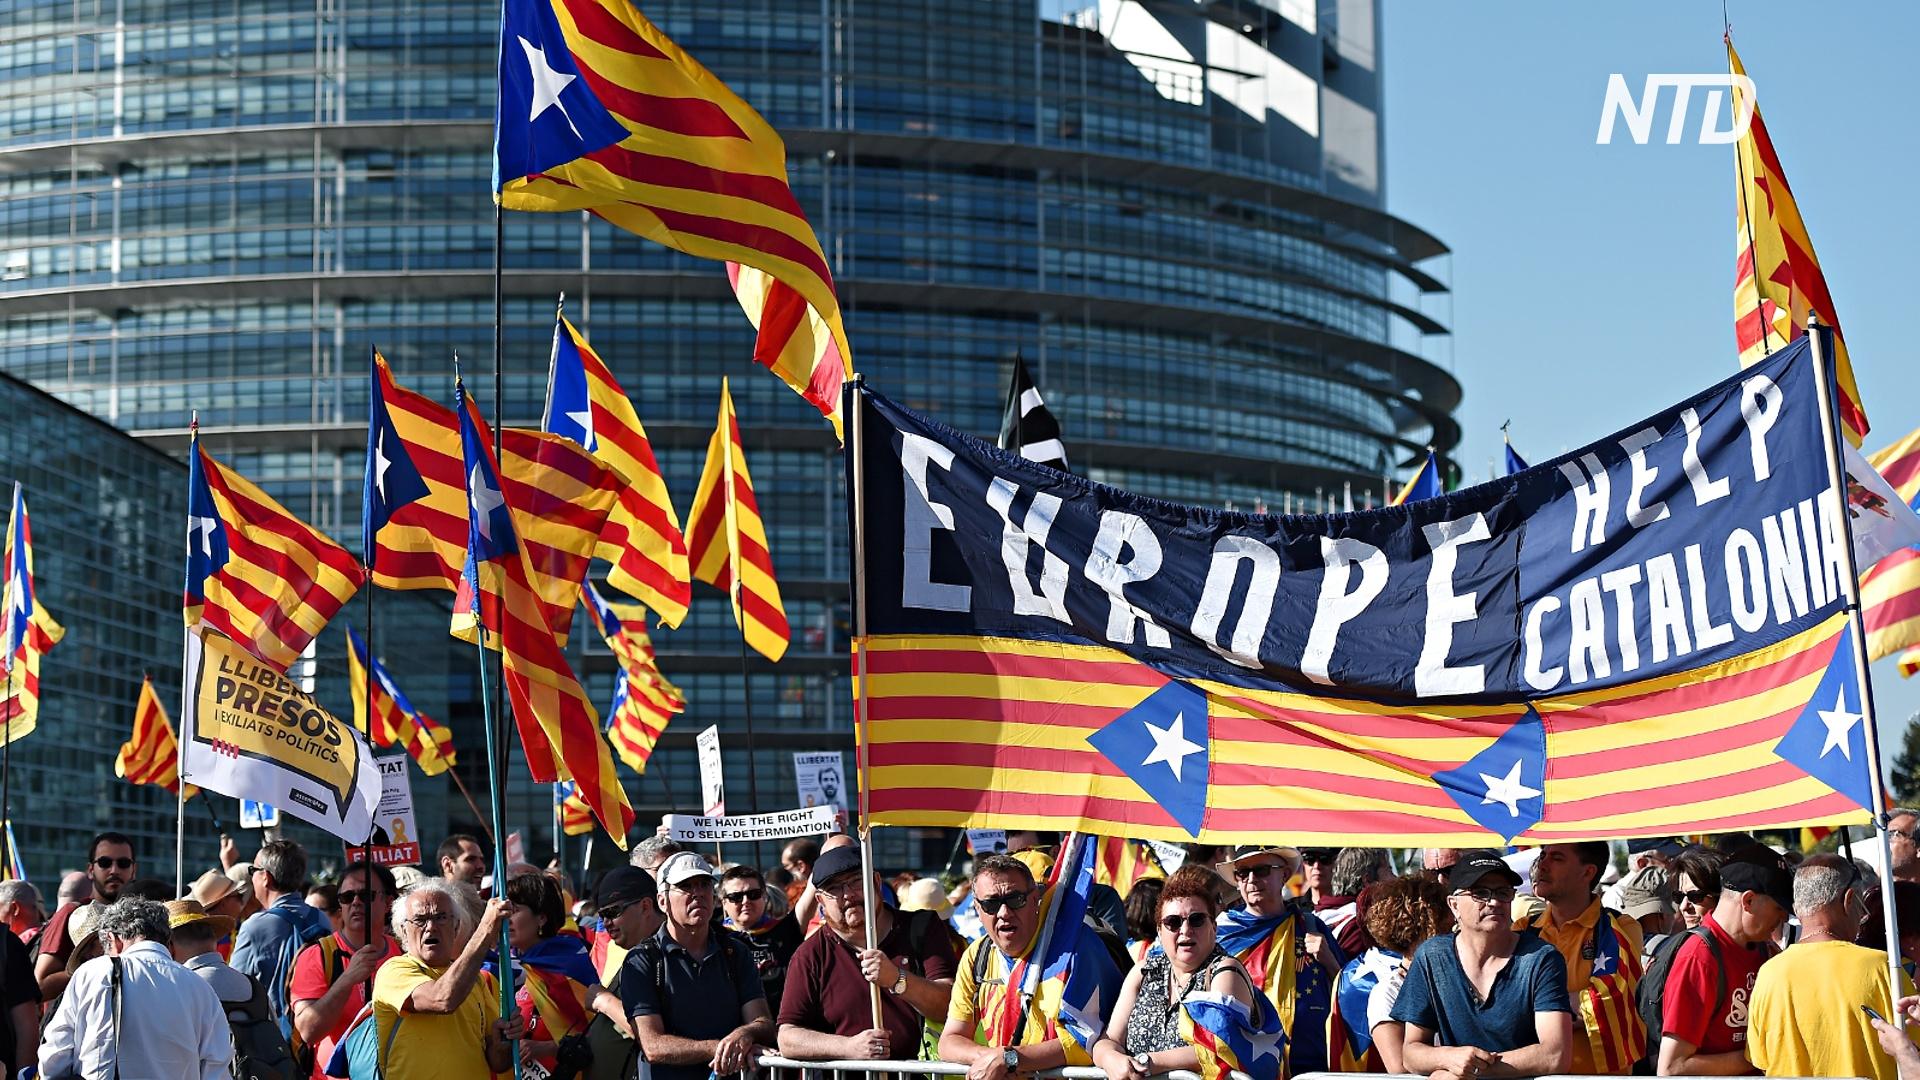 Каталонцы протестуют у Европарламента в поддержку евродепутата Пучдемона